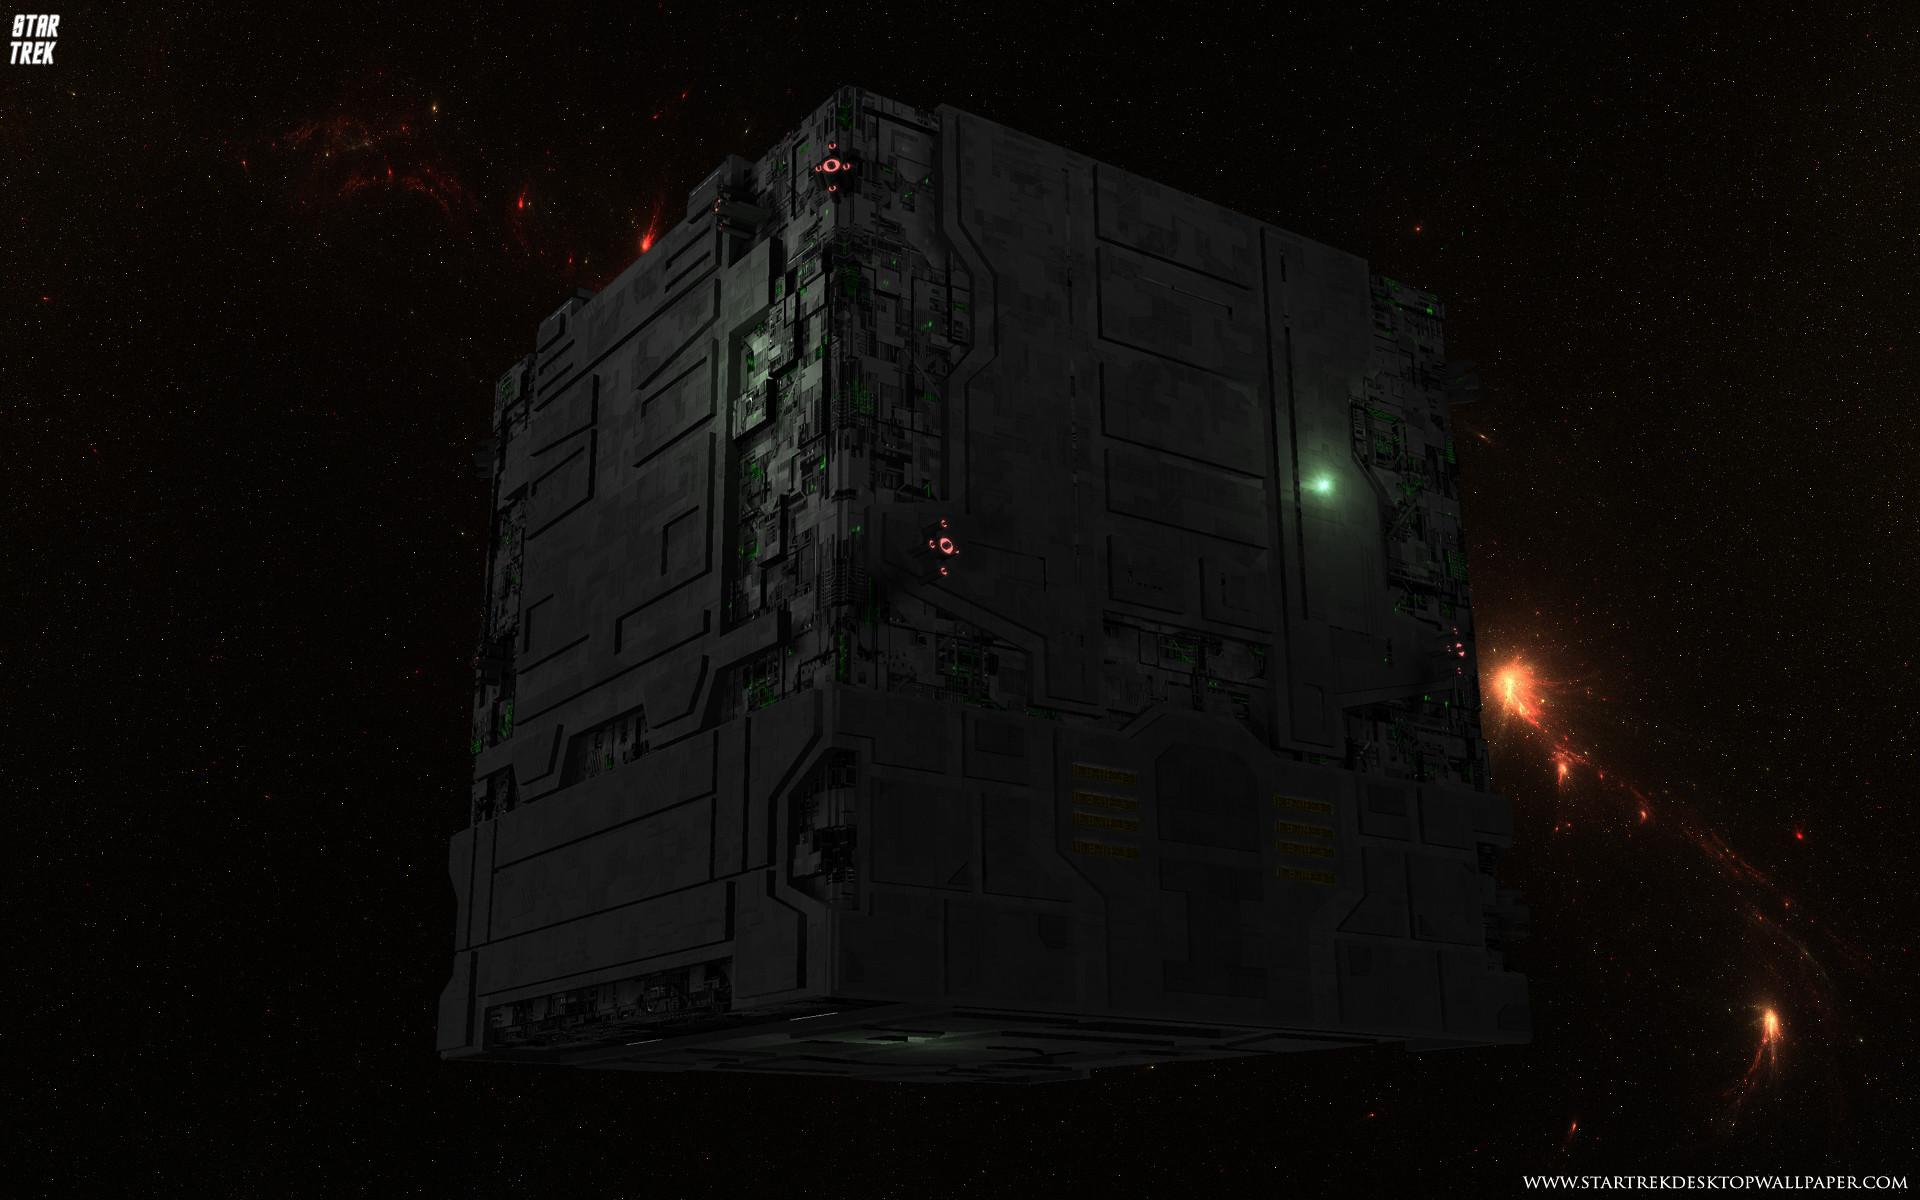 Star Trek Borg Tactical Cube. Free Star Trek computer desktop wallpaper,  images, pictures